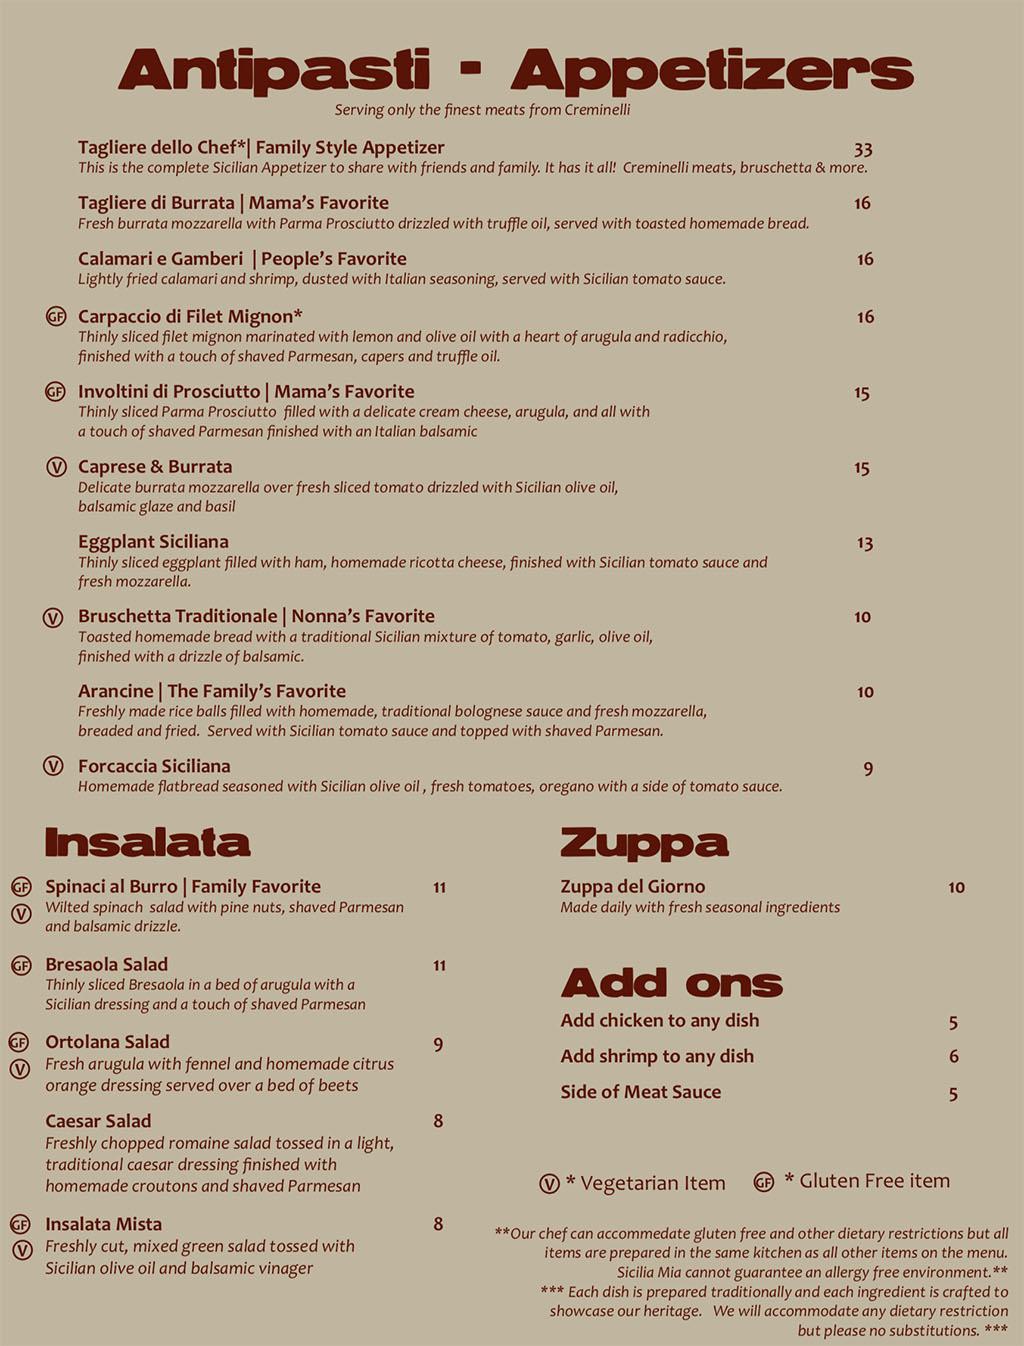 Sicilia Mia menu - appetizers, soup, salad, add ons